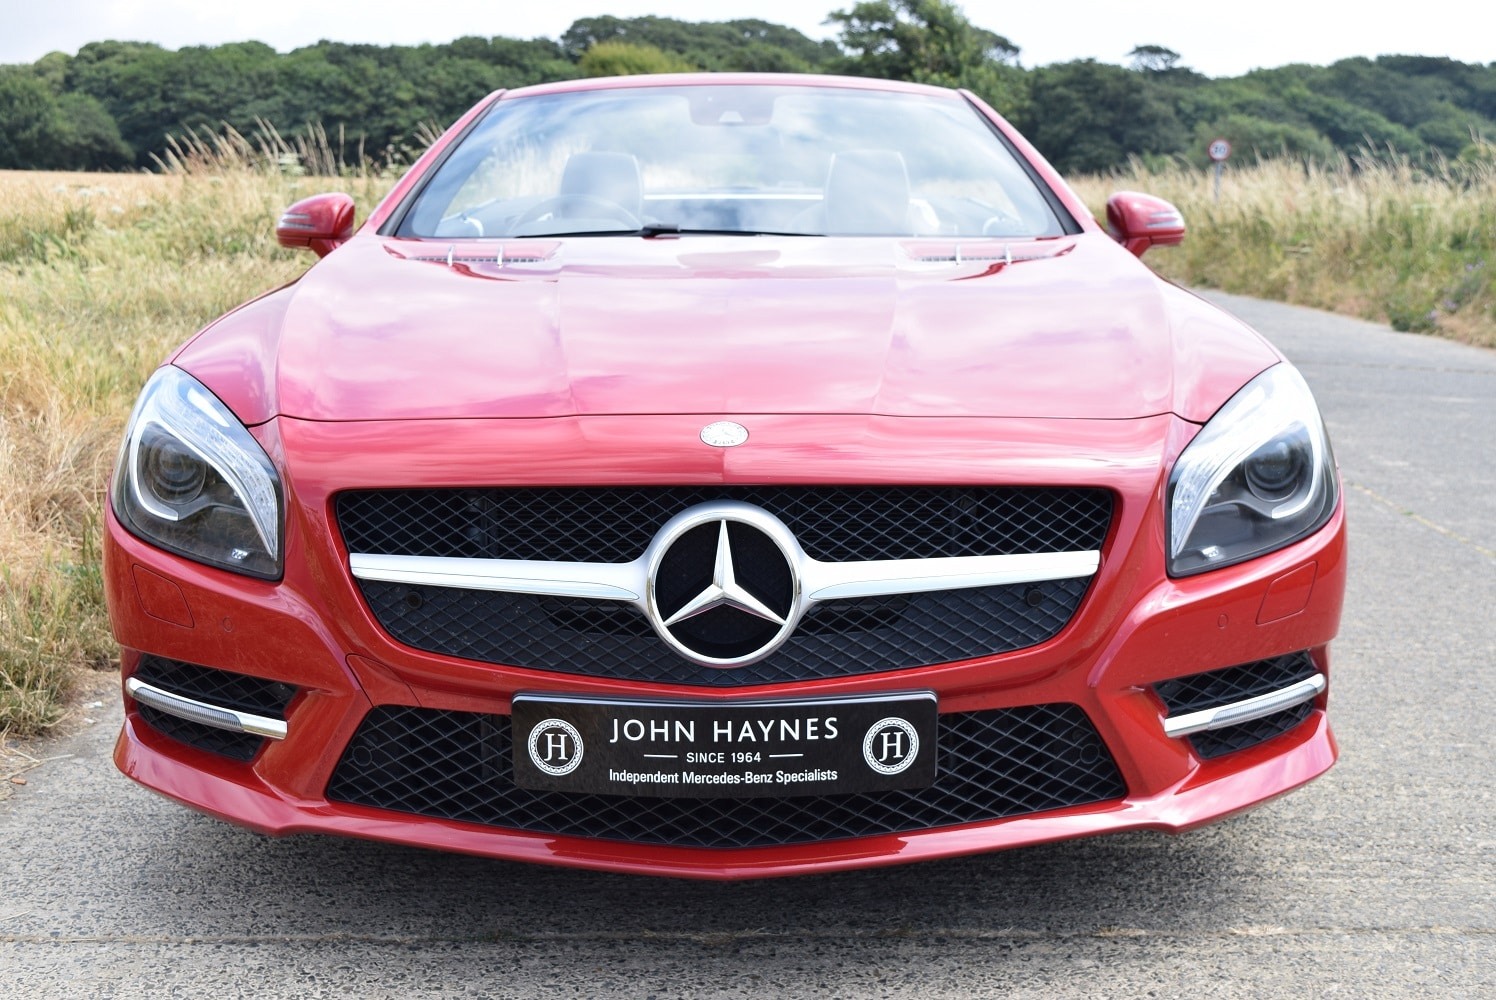 2013 Mercedes-Benz SL350 in Fire Opal Red